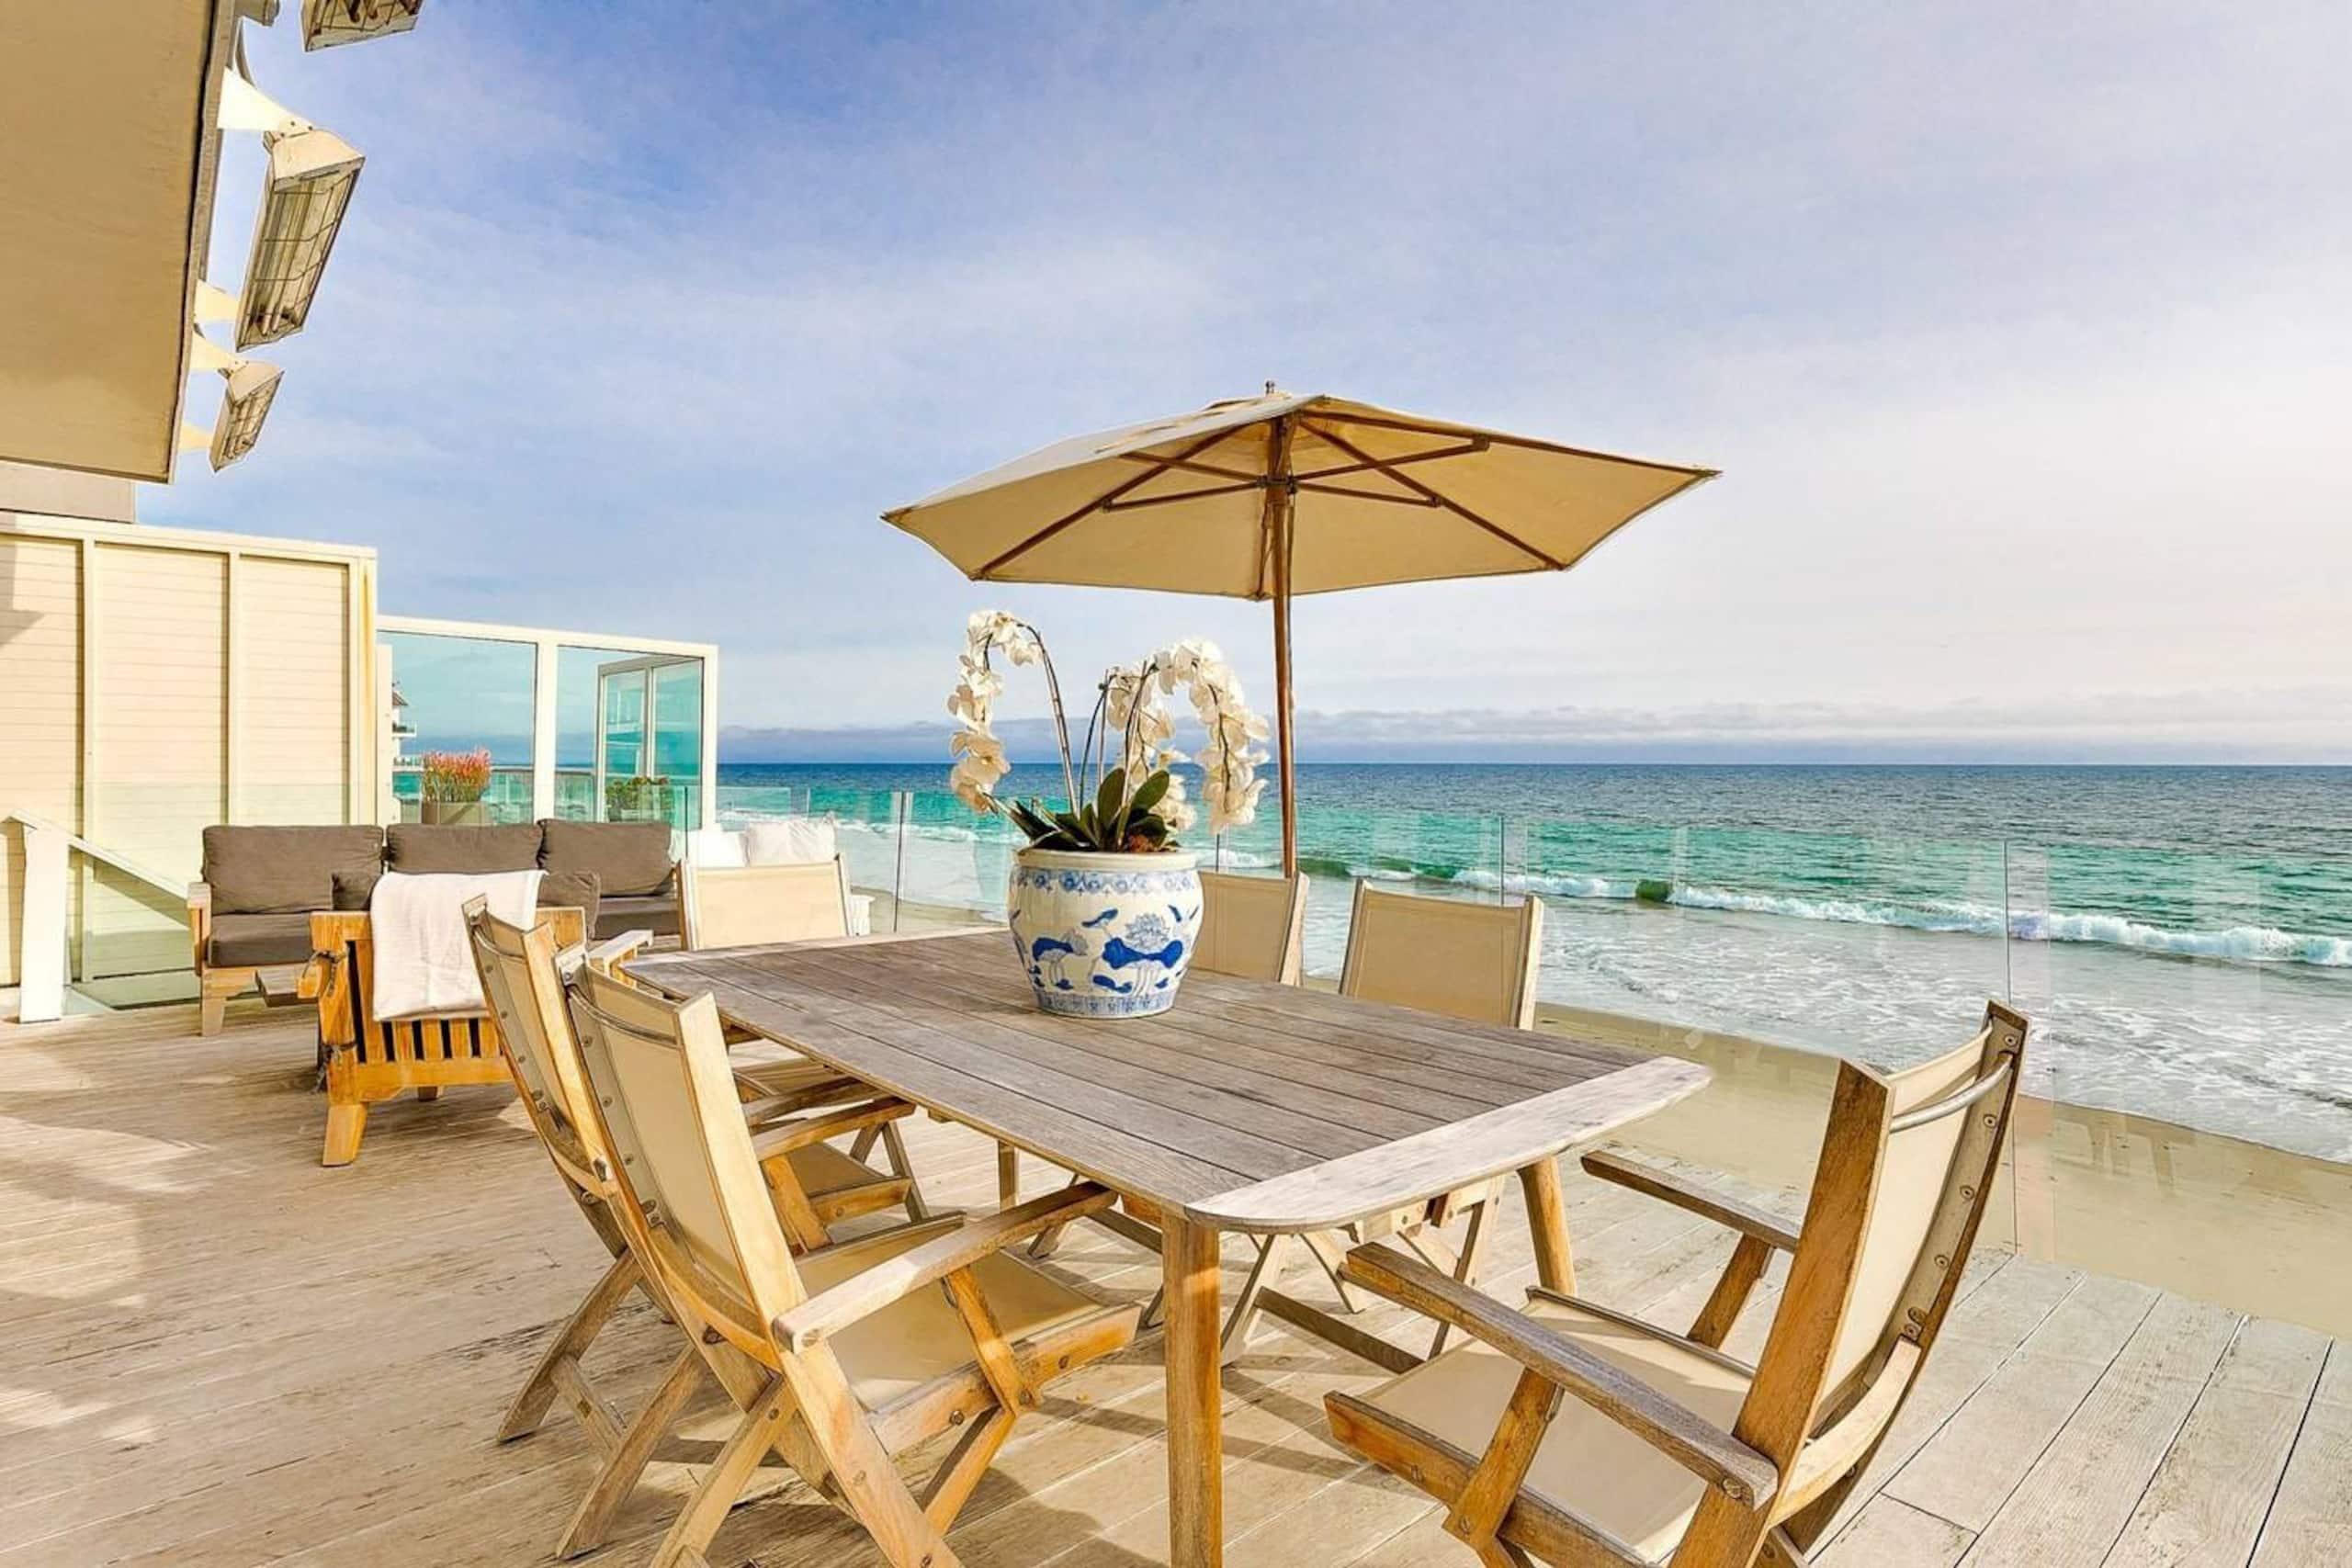 Apartment Villa Shawaiz - Beachfront Villa with 5 beds  photo 20360805